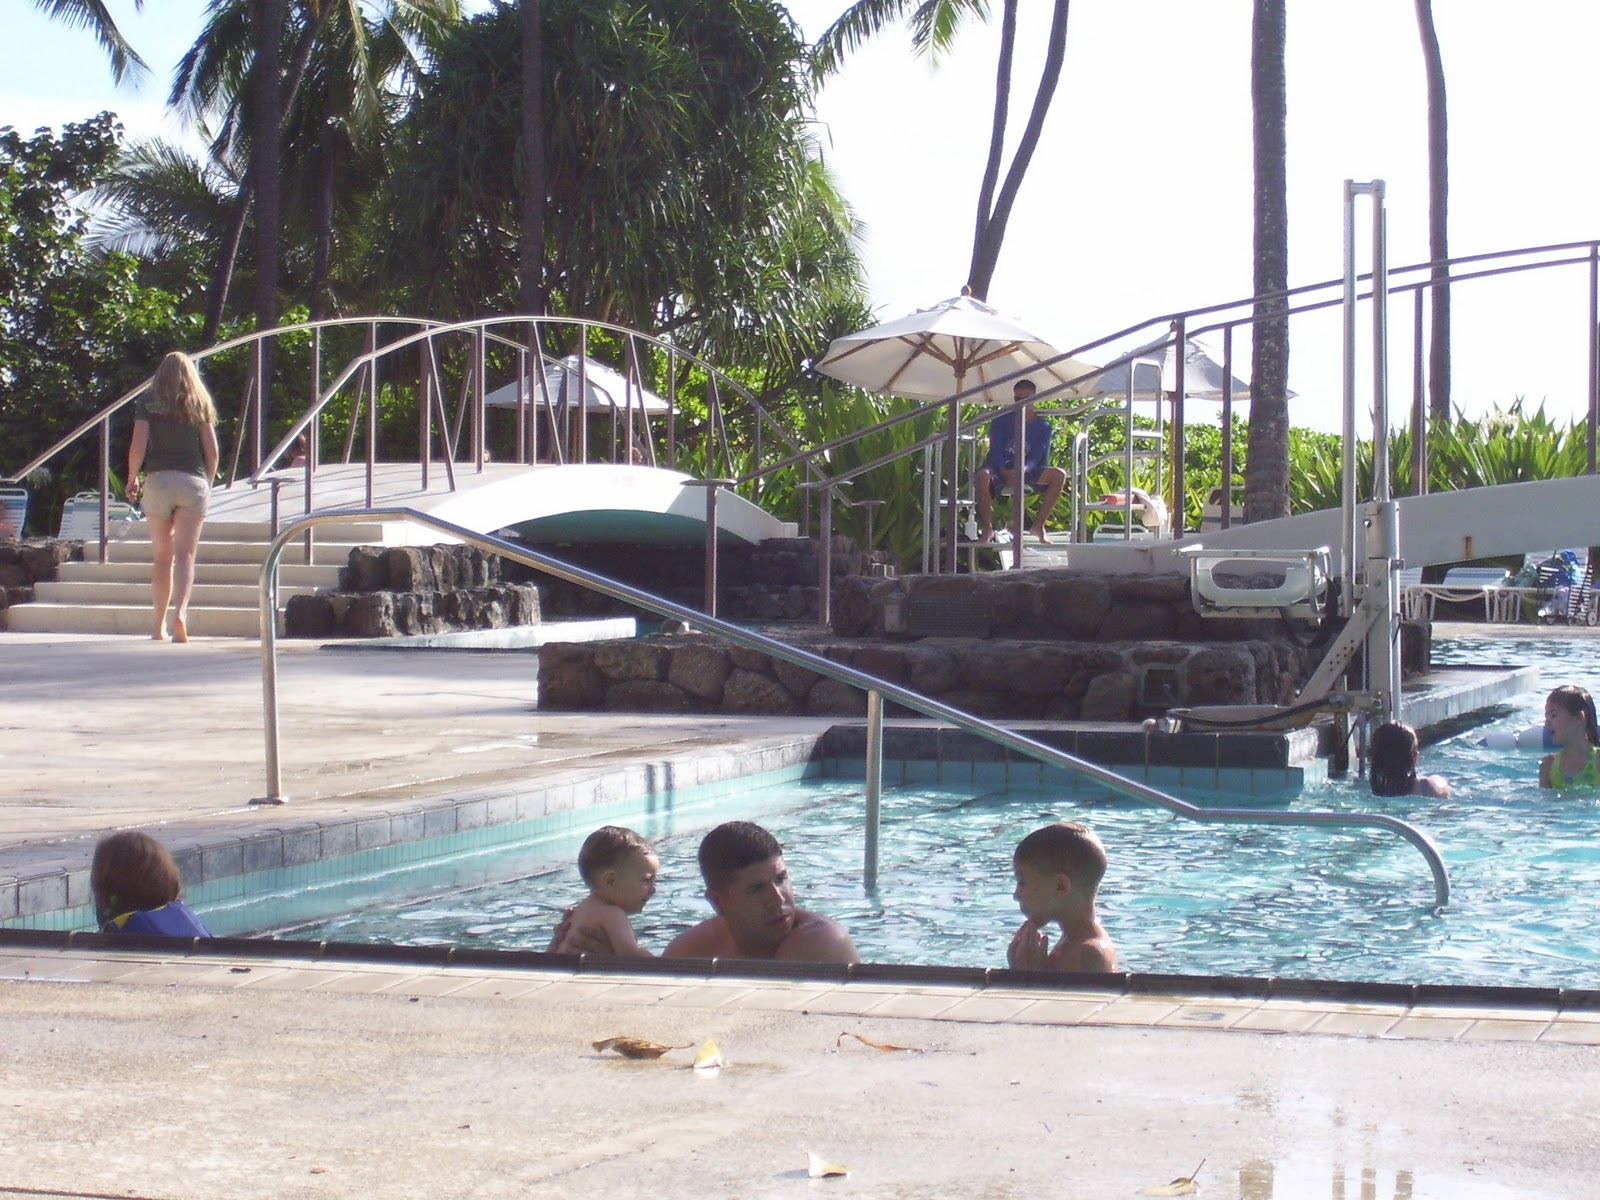 Hale Koa military resort on Waikiki Beach Honolulu Hawaii